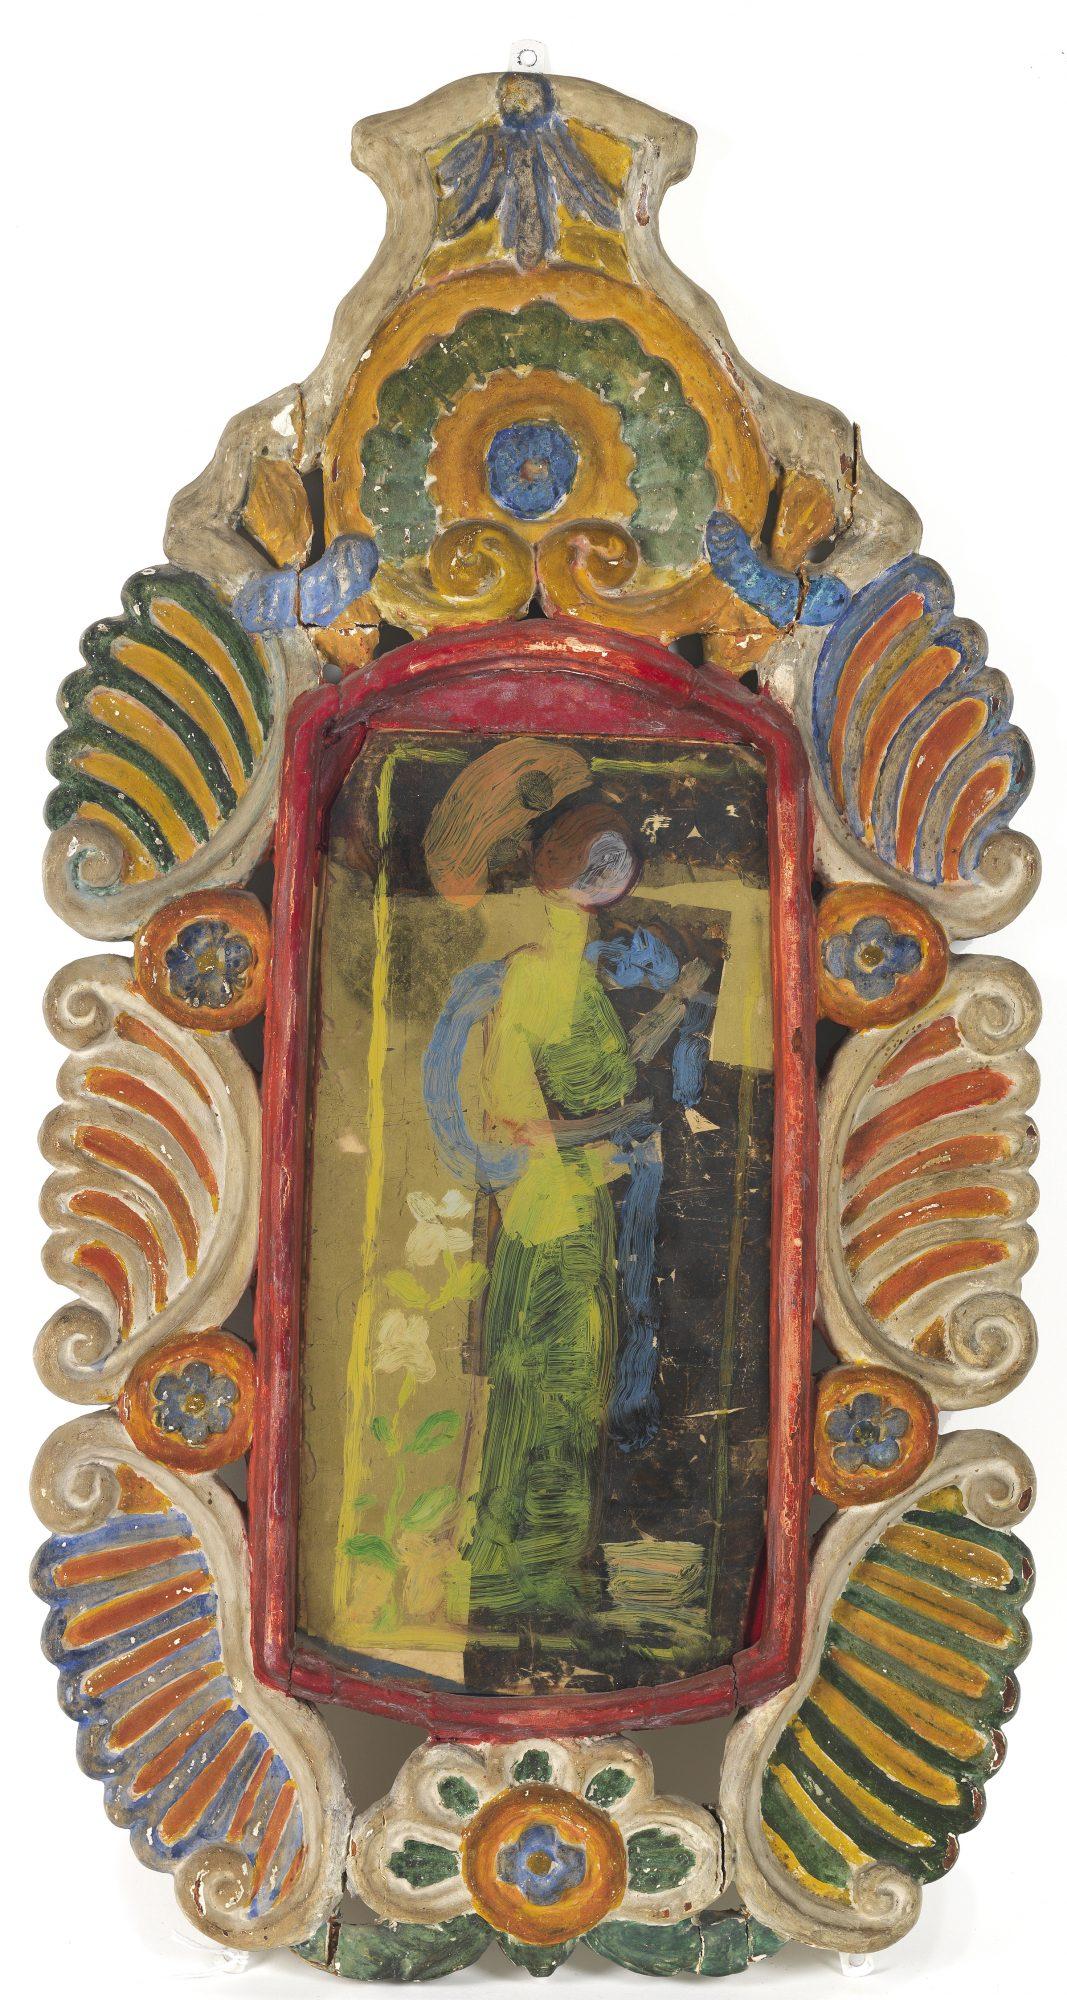 Maurice Brazil Prendergast (American, 1858-1924) Charles Prendergast (American, 1863–1948) Painting on Glass, Frame by Charles Prendergast, c. 1912–1917. Painting on glass, 21 1/4 x 11 1/2 in. Gift of Mrs. Charles Prendergast, 86.18.21